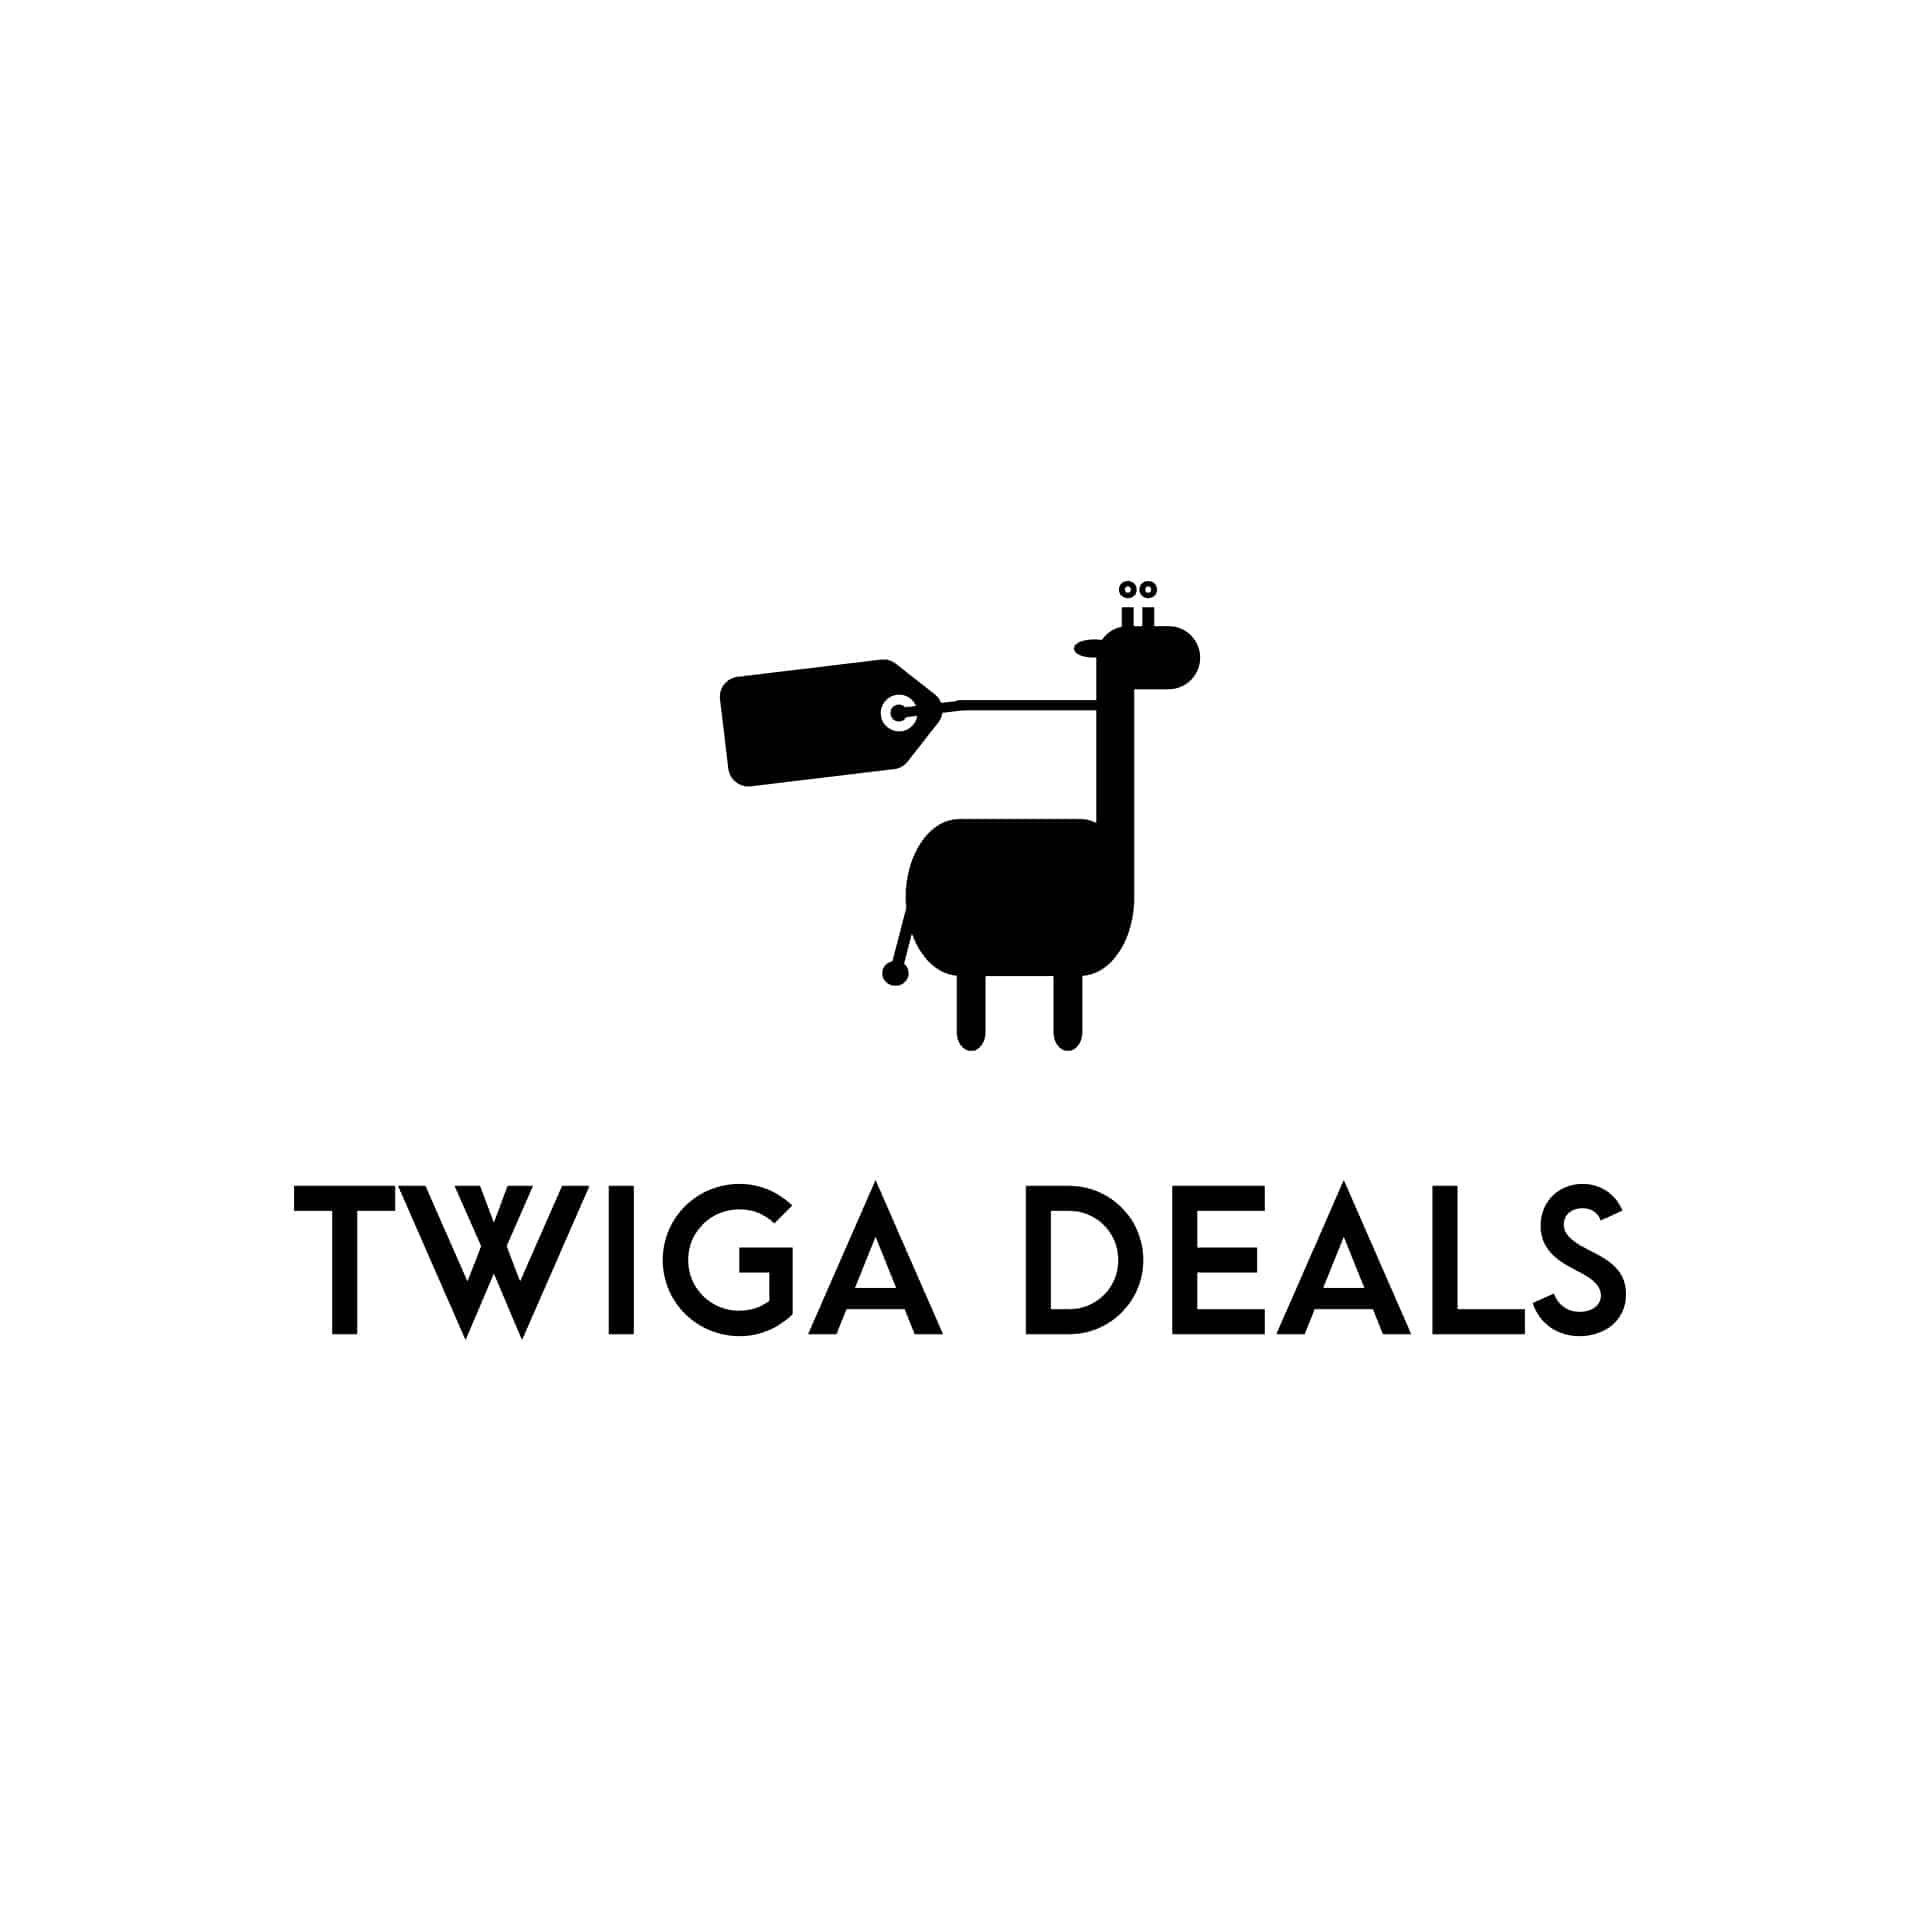 PROPAGANDA - twigadeals logobw